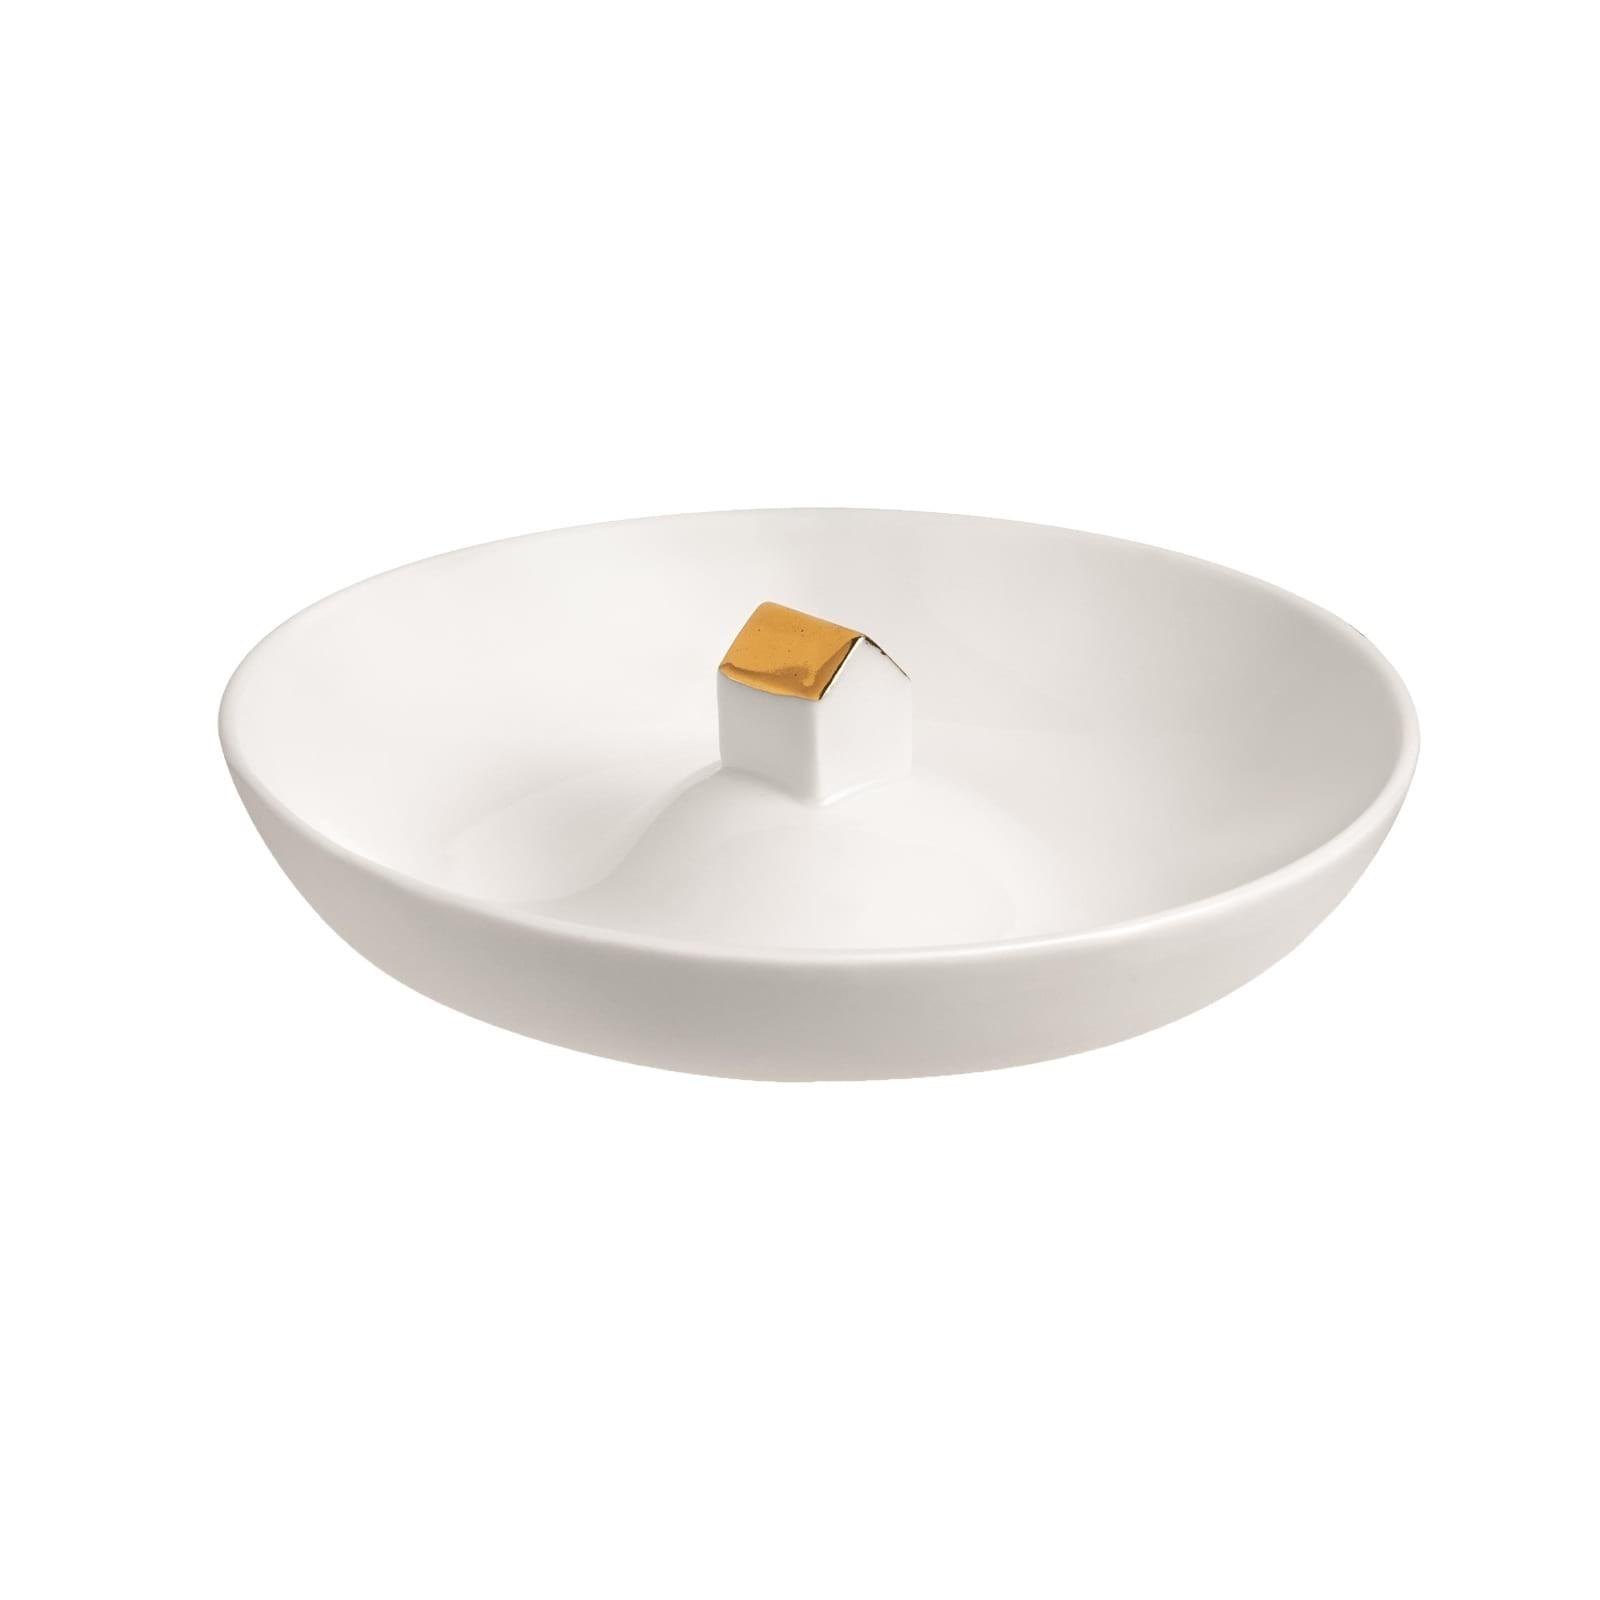 Haus Porcelain Bowl - Raeder